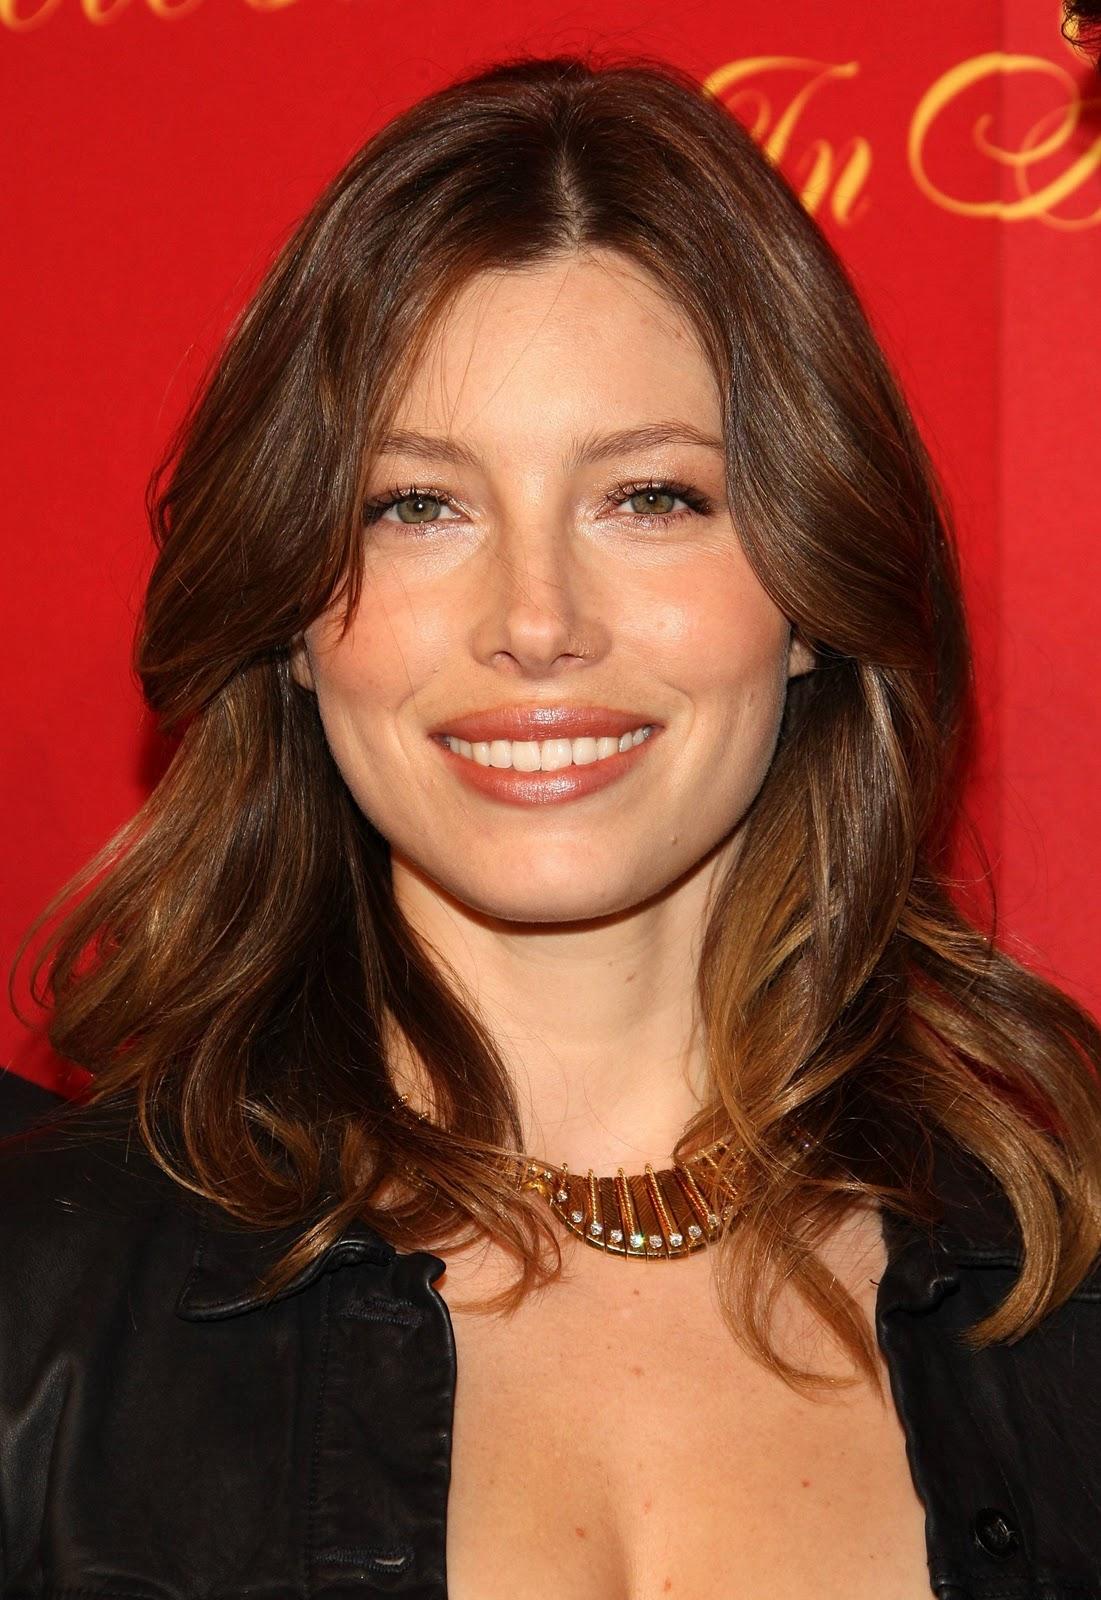 http://2.bp.blogspot.com/-_b-SS_A5uc4/TrOYHf5BNKI/AAAAAAAACTI/AZyzpNL88I8/s1600/Jessica_biel.jpg